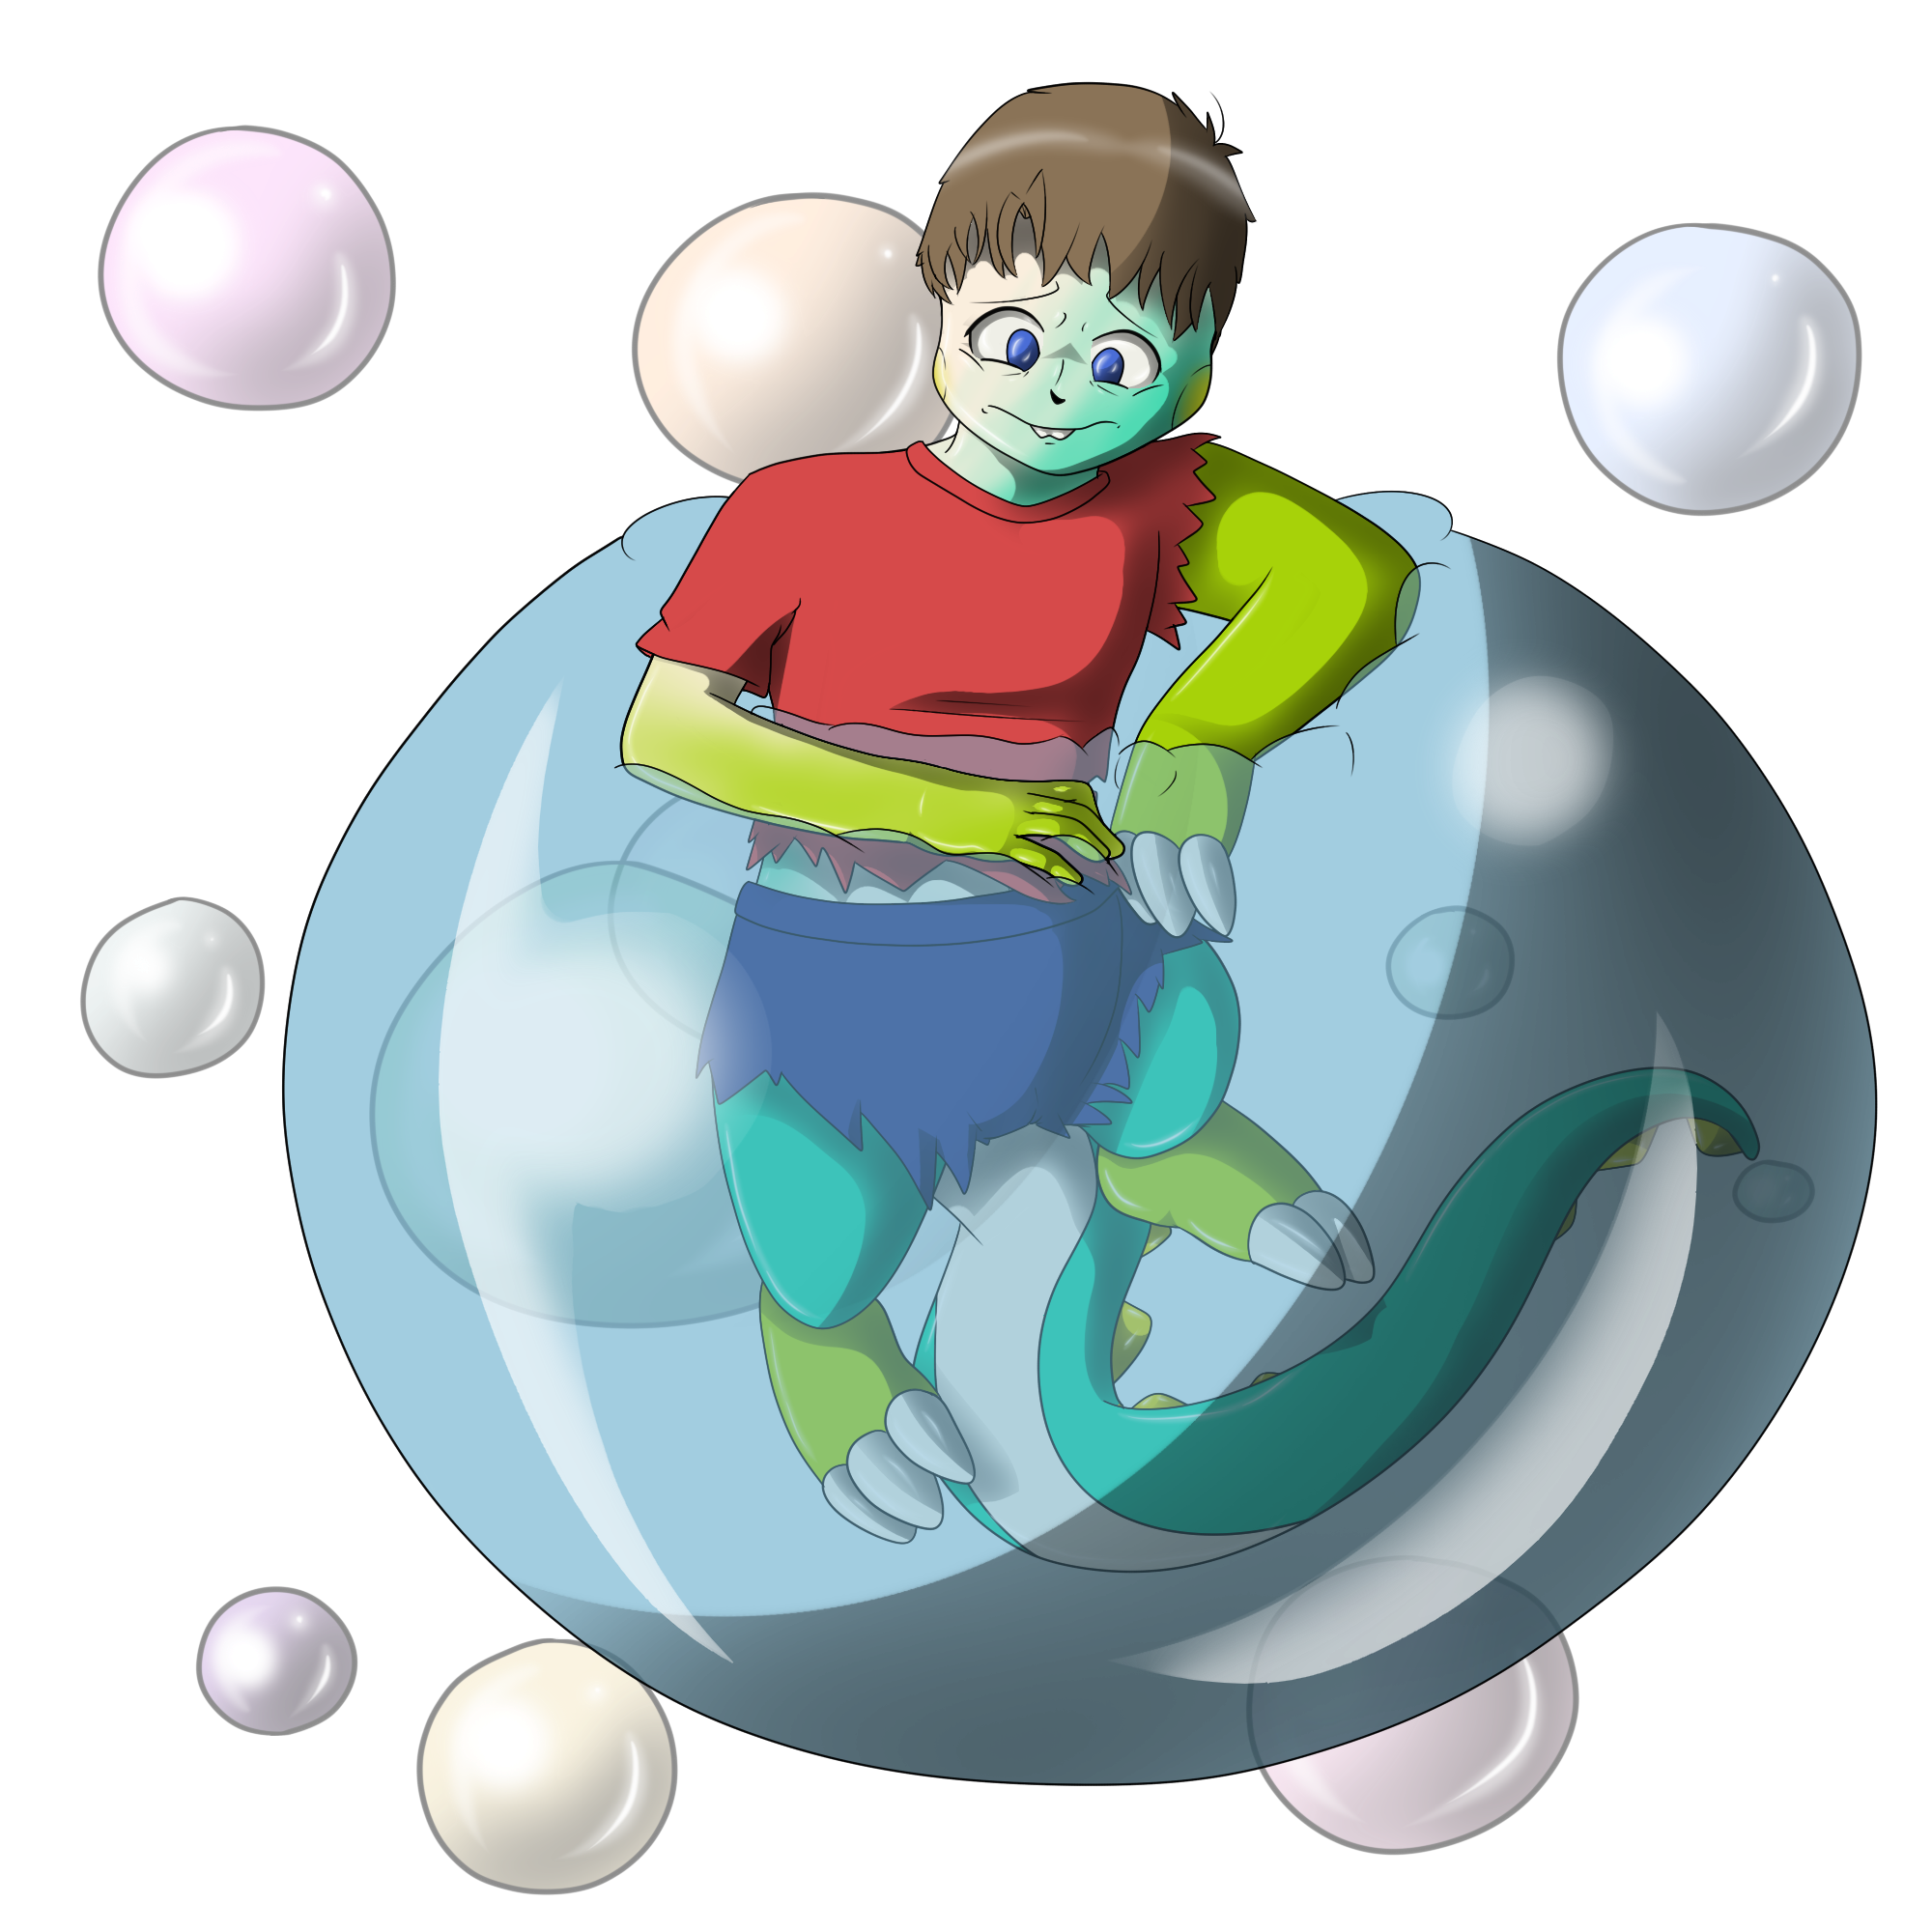 .:REQUEST:. Human to Bubble Dragon (TF) by Kendulun-the-Kihoryu